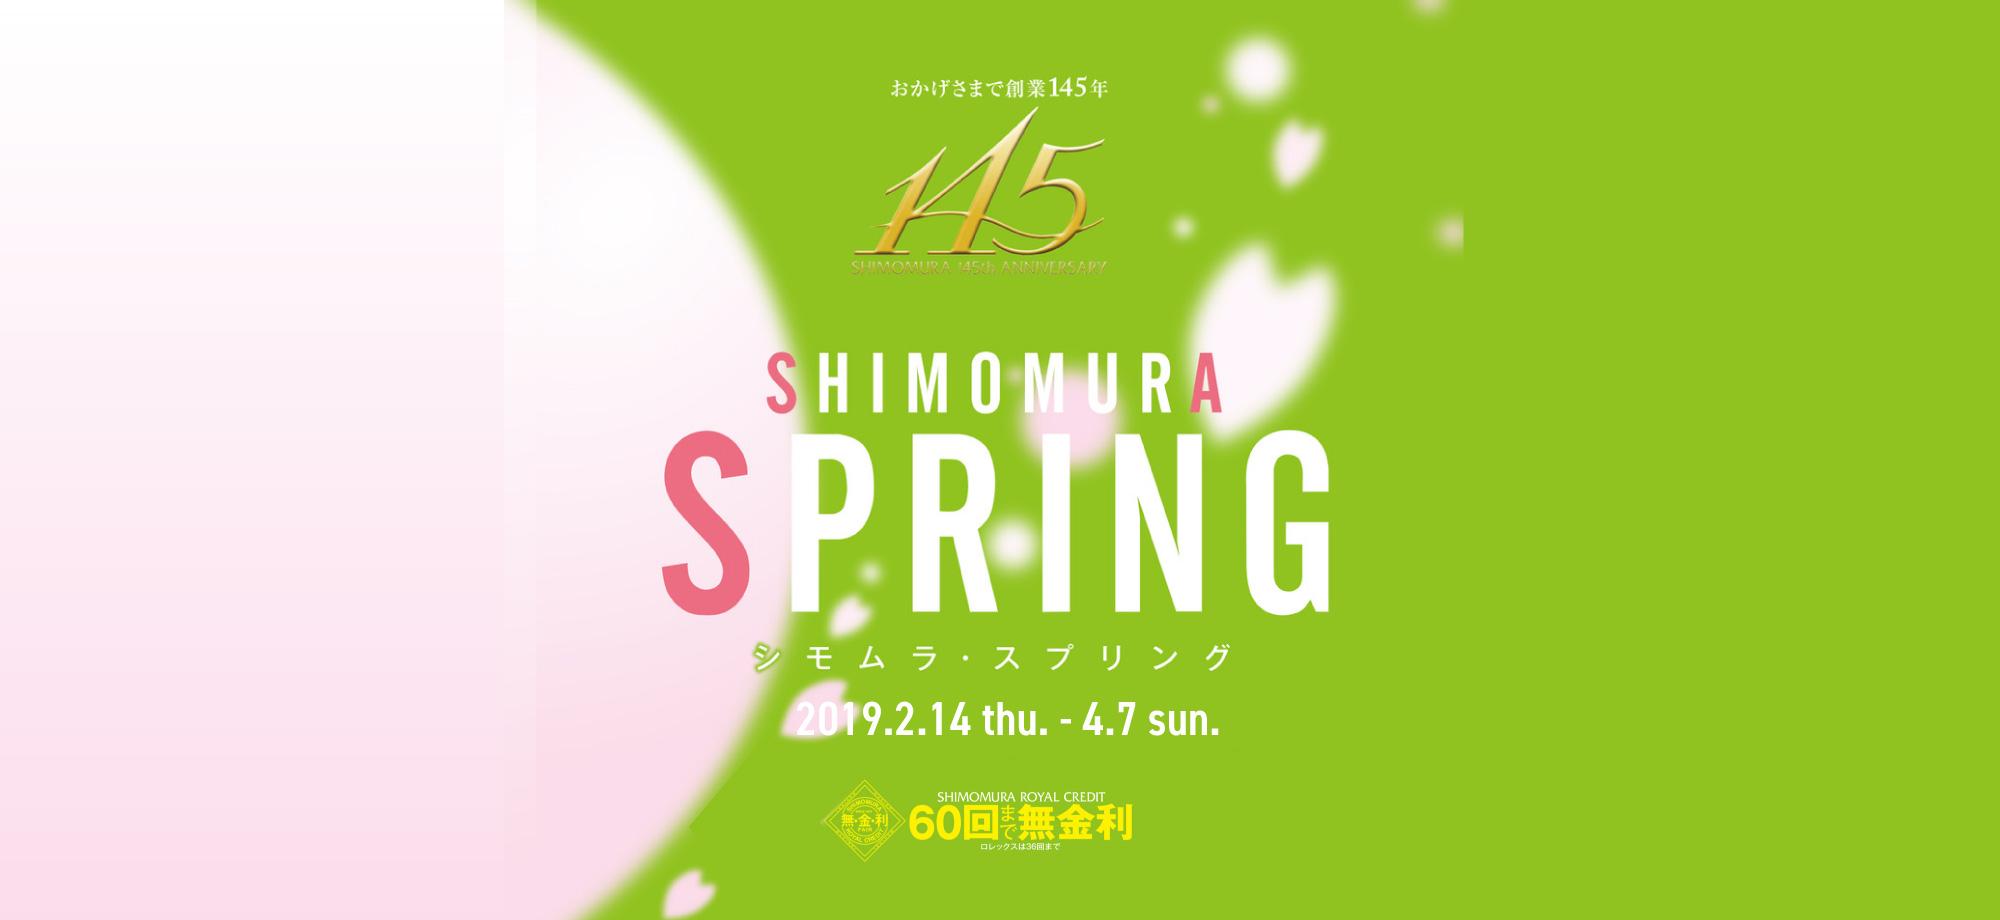 SHIOMOMURA SPRING